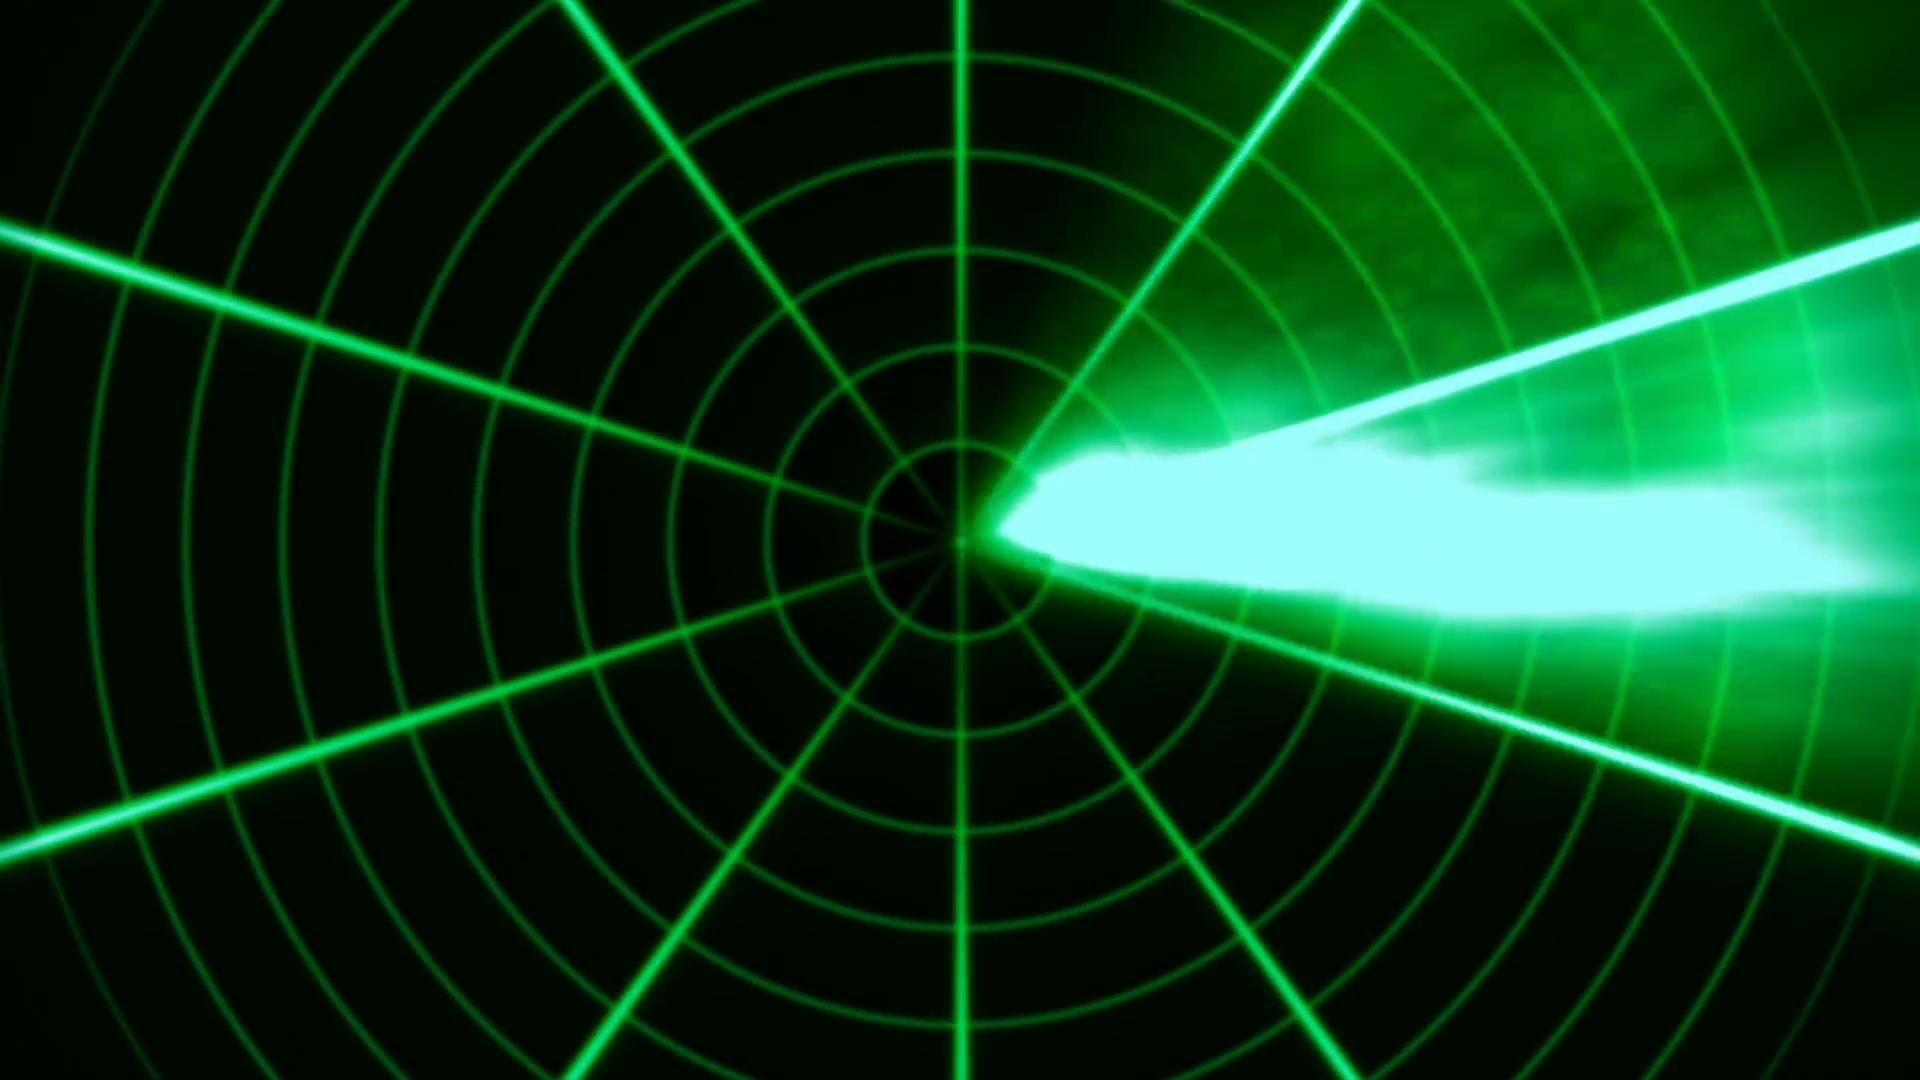 Radar Animated Loop 2 Motion Background.